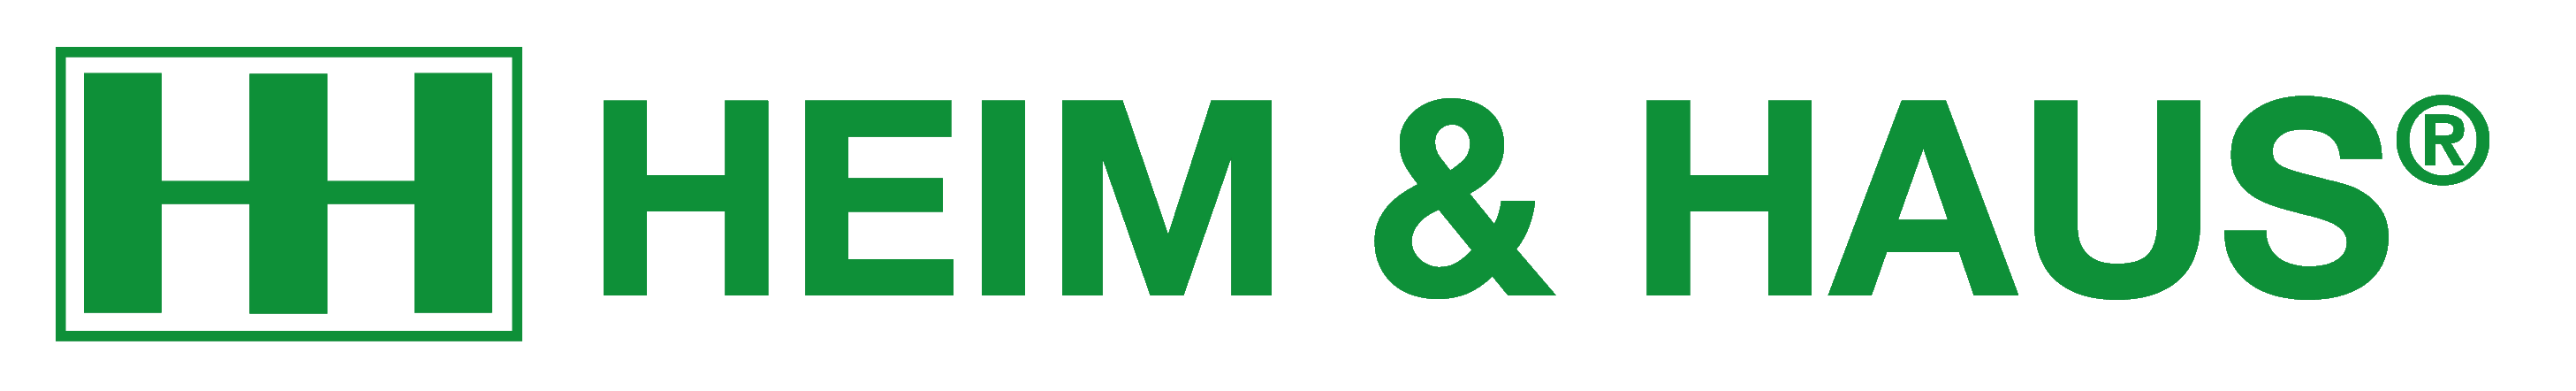 Heim & Haus Logo